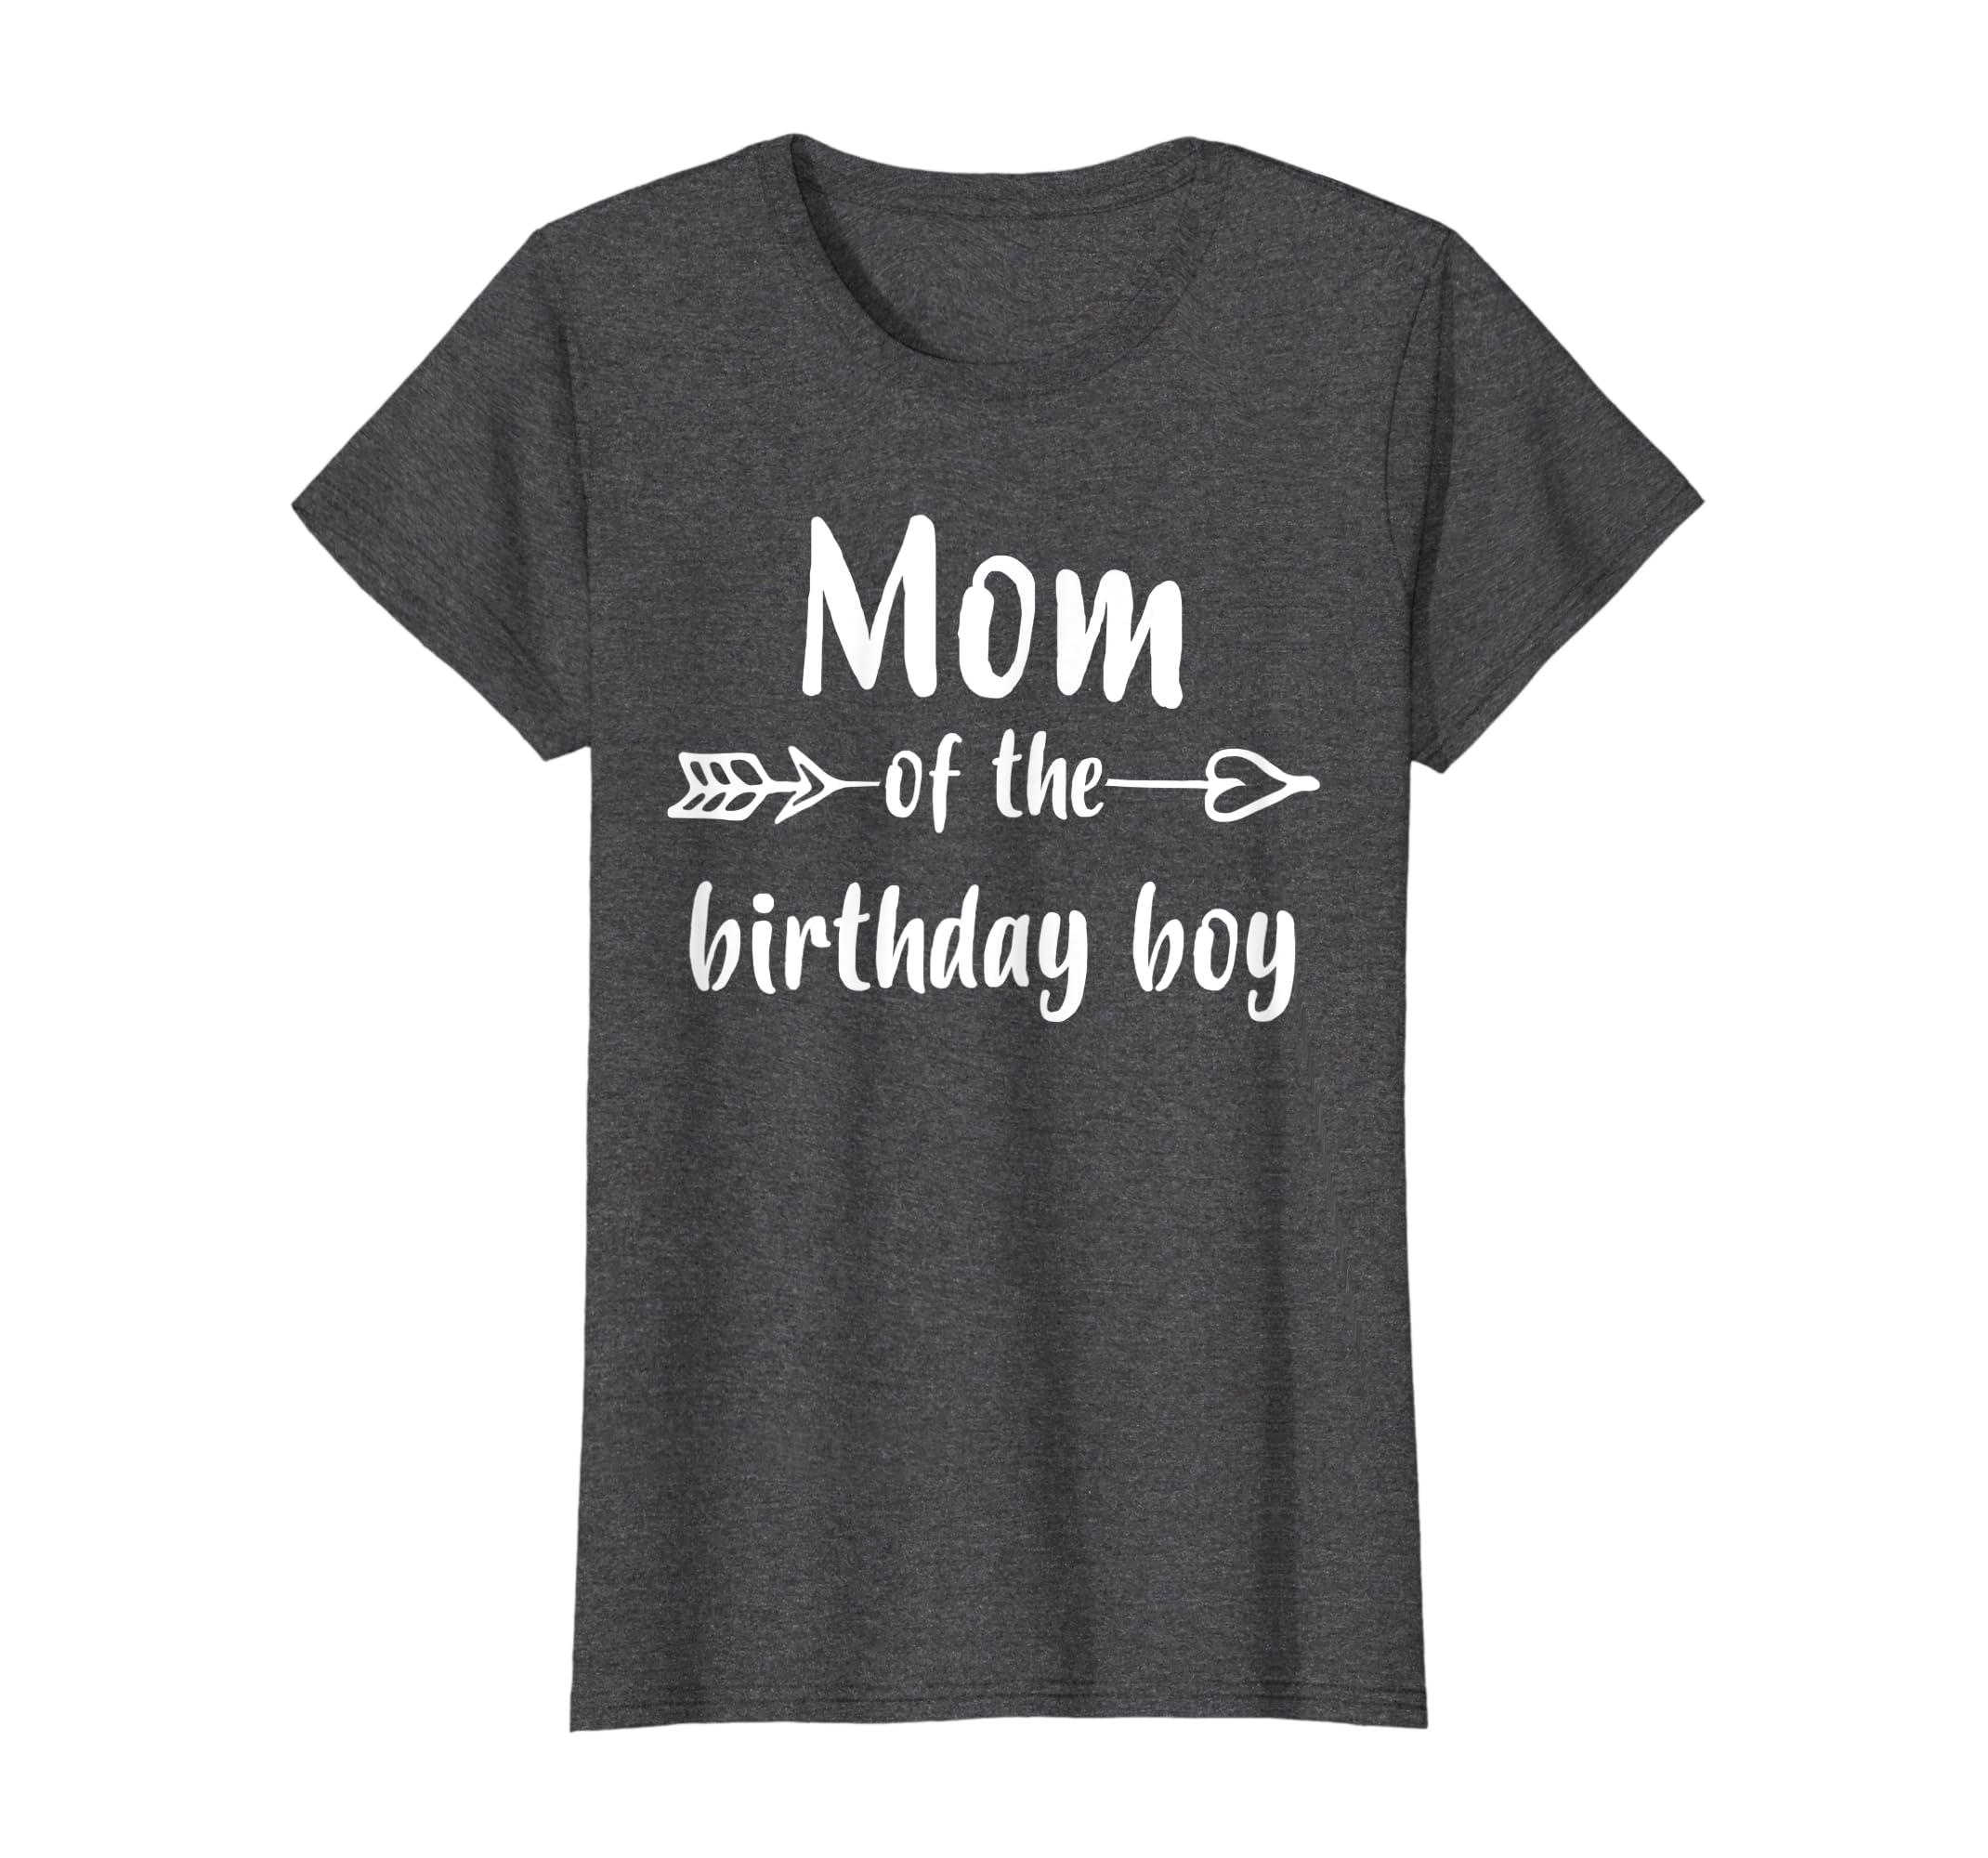 Amazon Womens Birthday Boy Mom Shirt Clothing